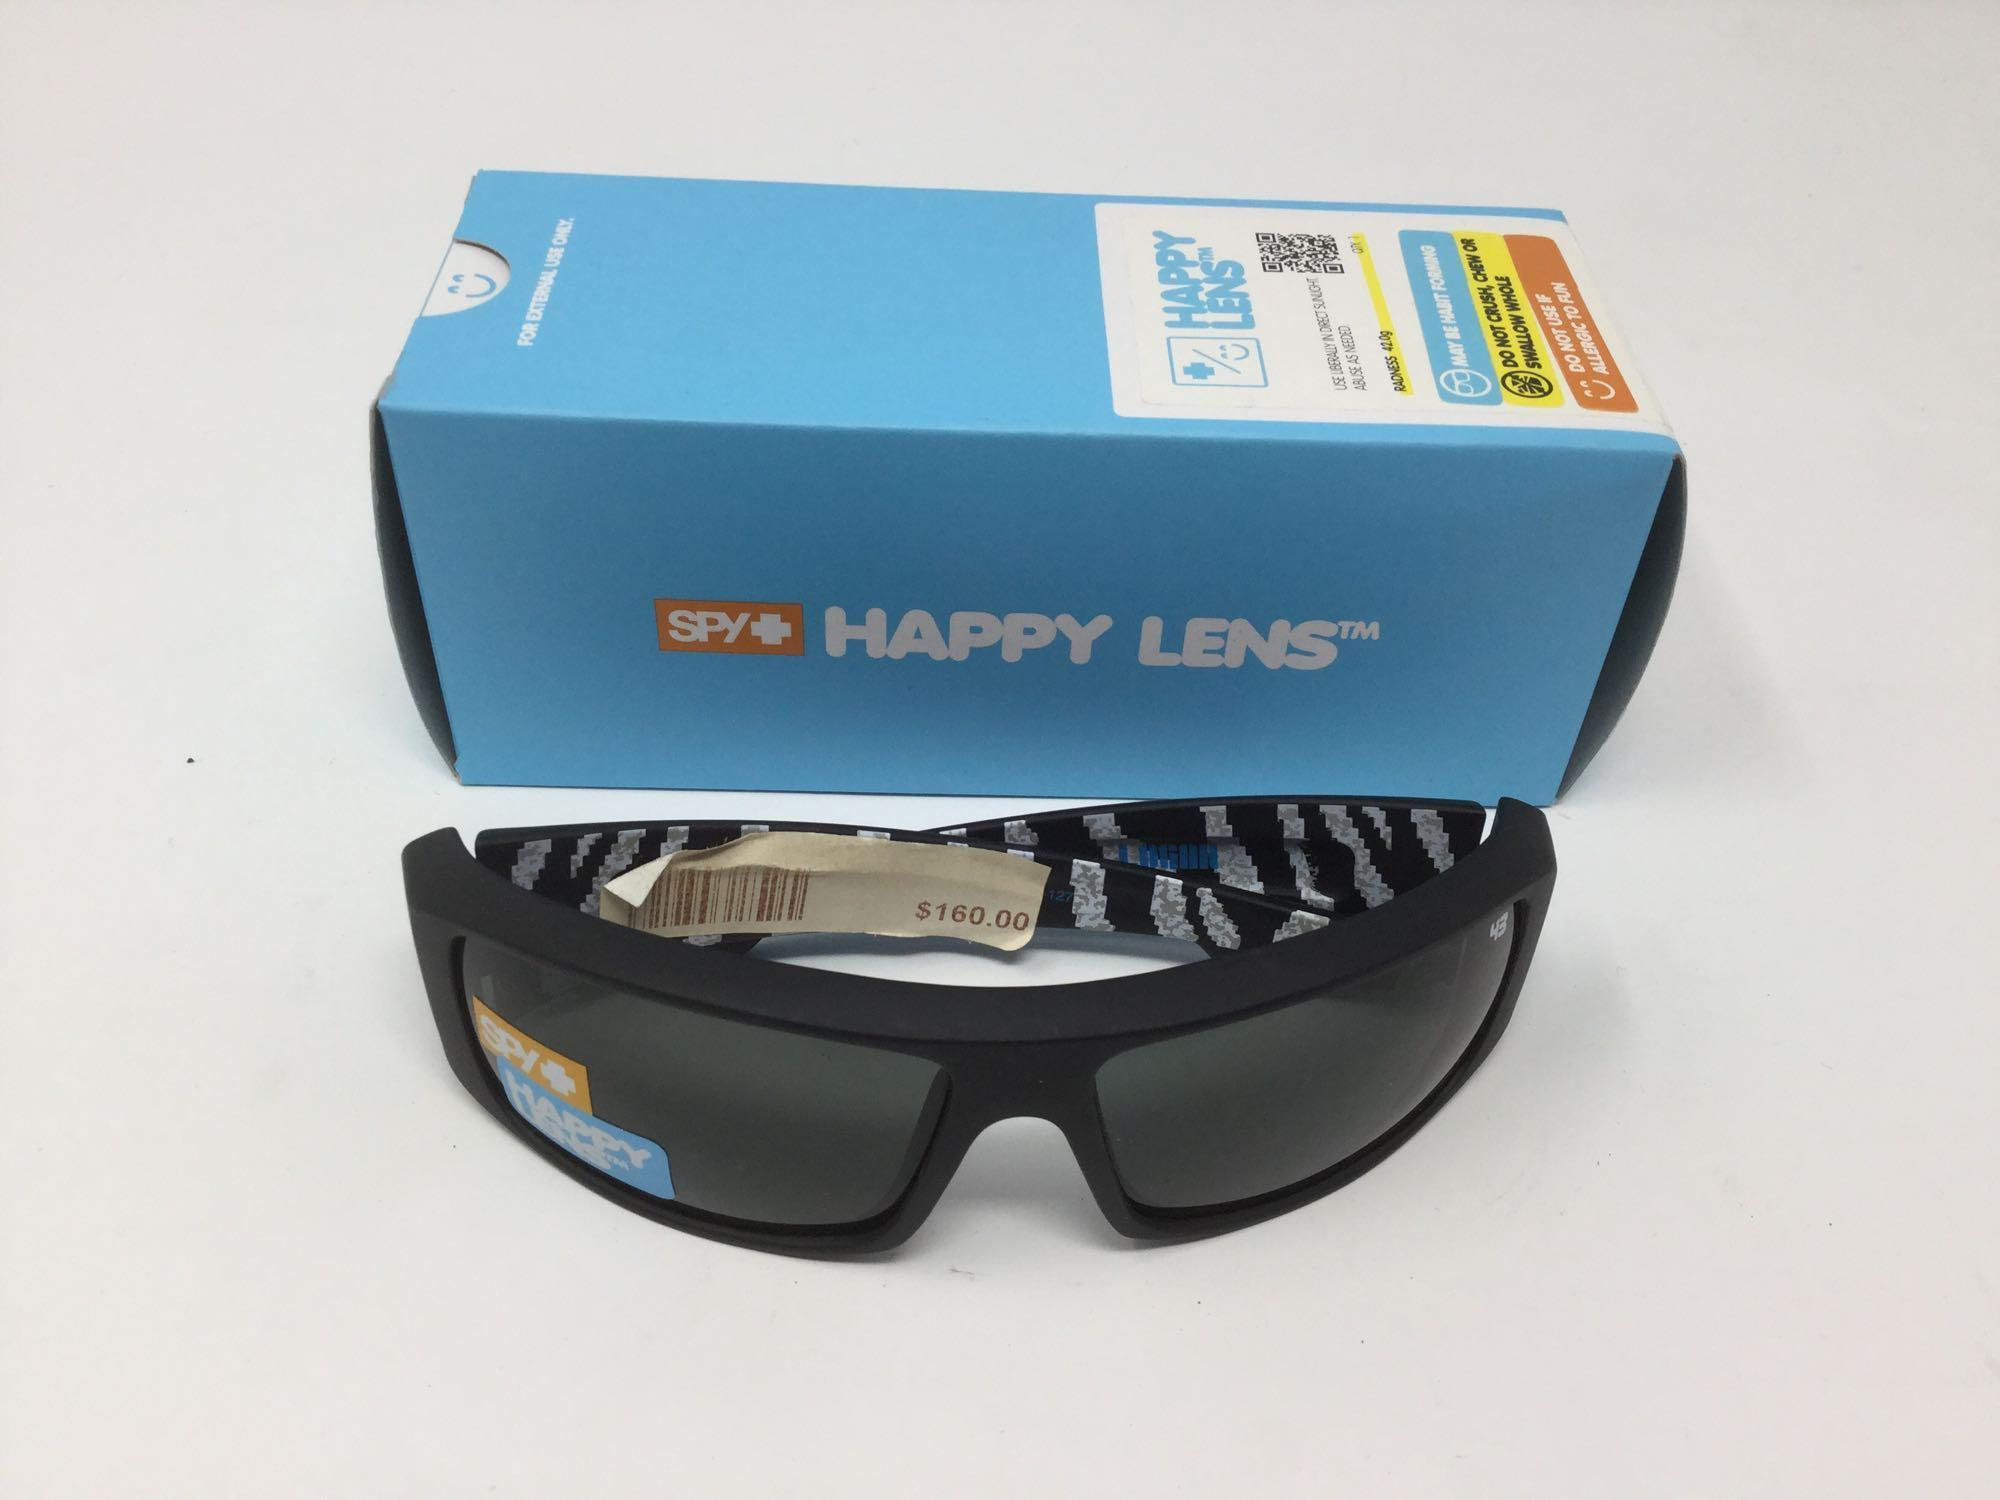 Lot 1 - Spy Happy Lens Sunglasses - Retail $160.00